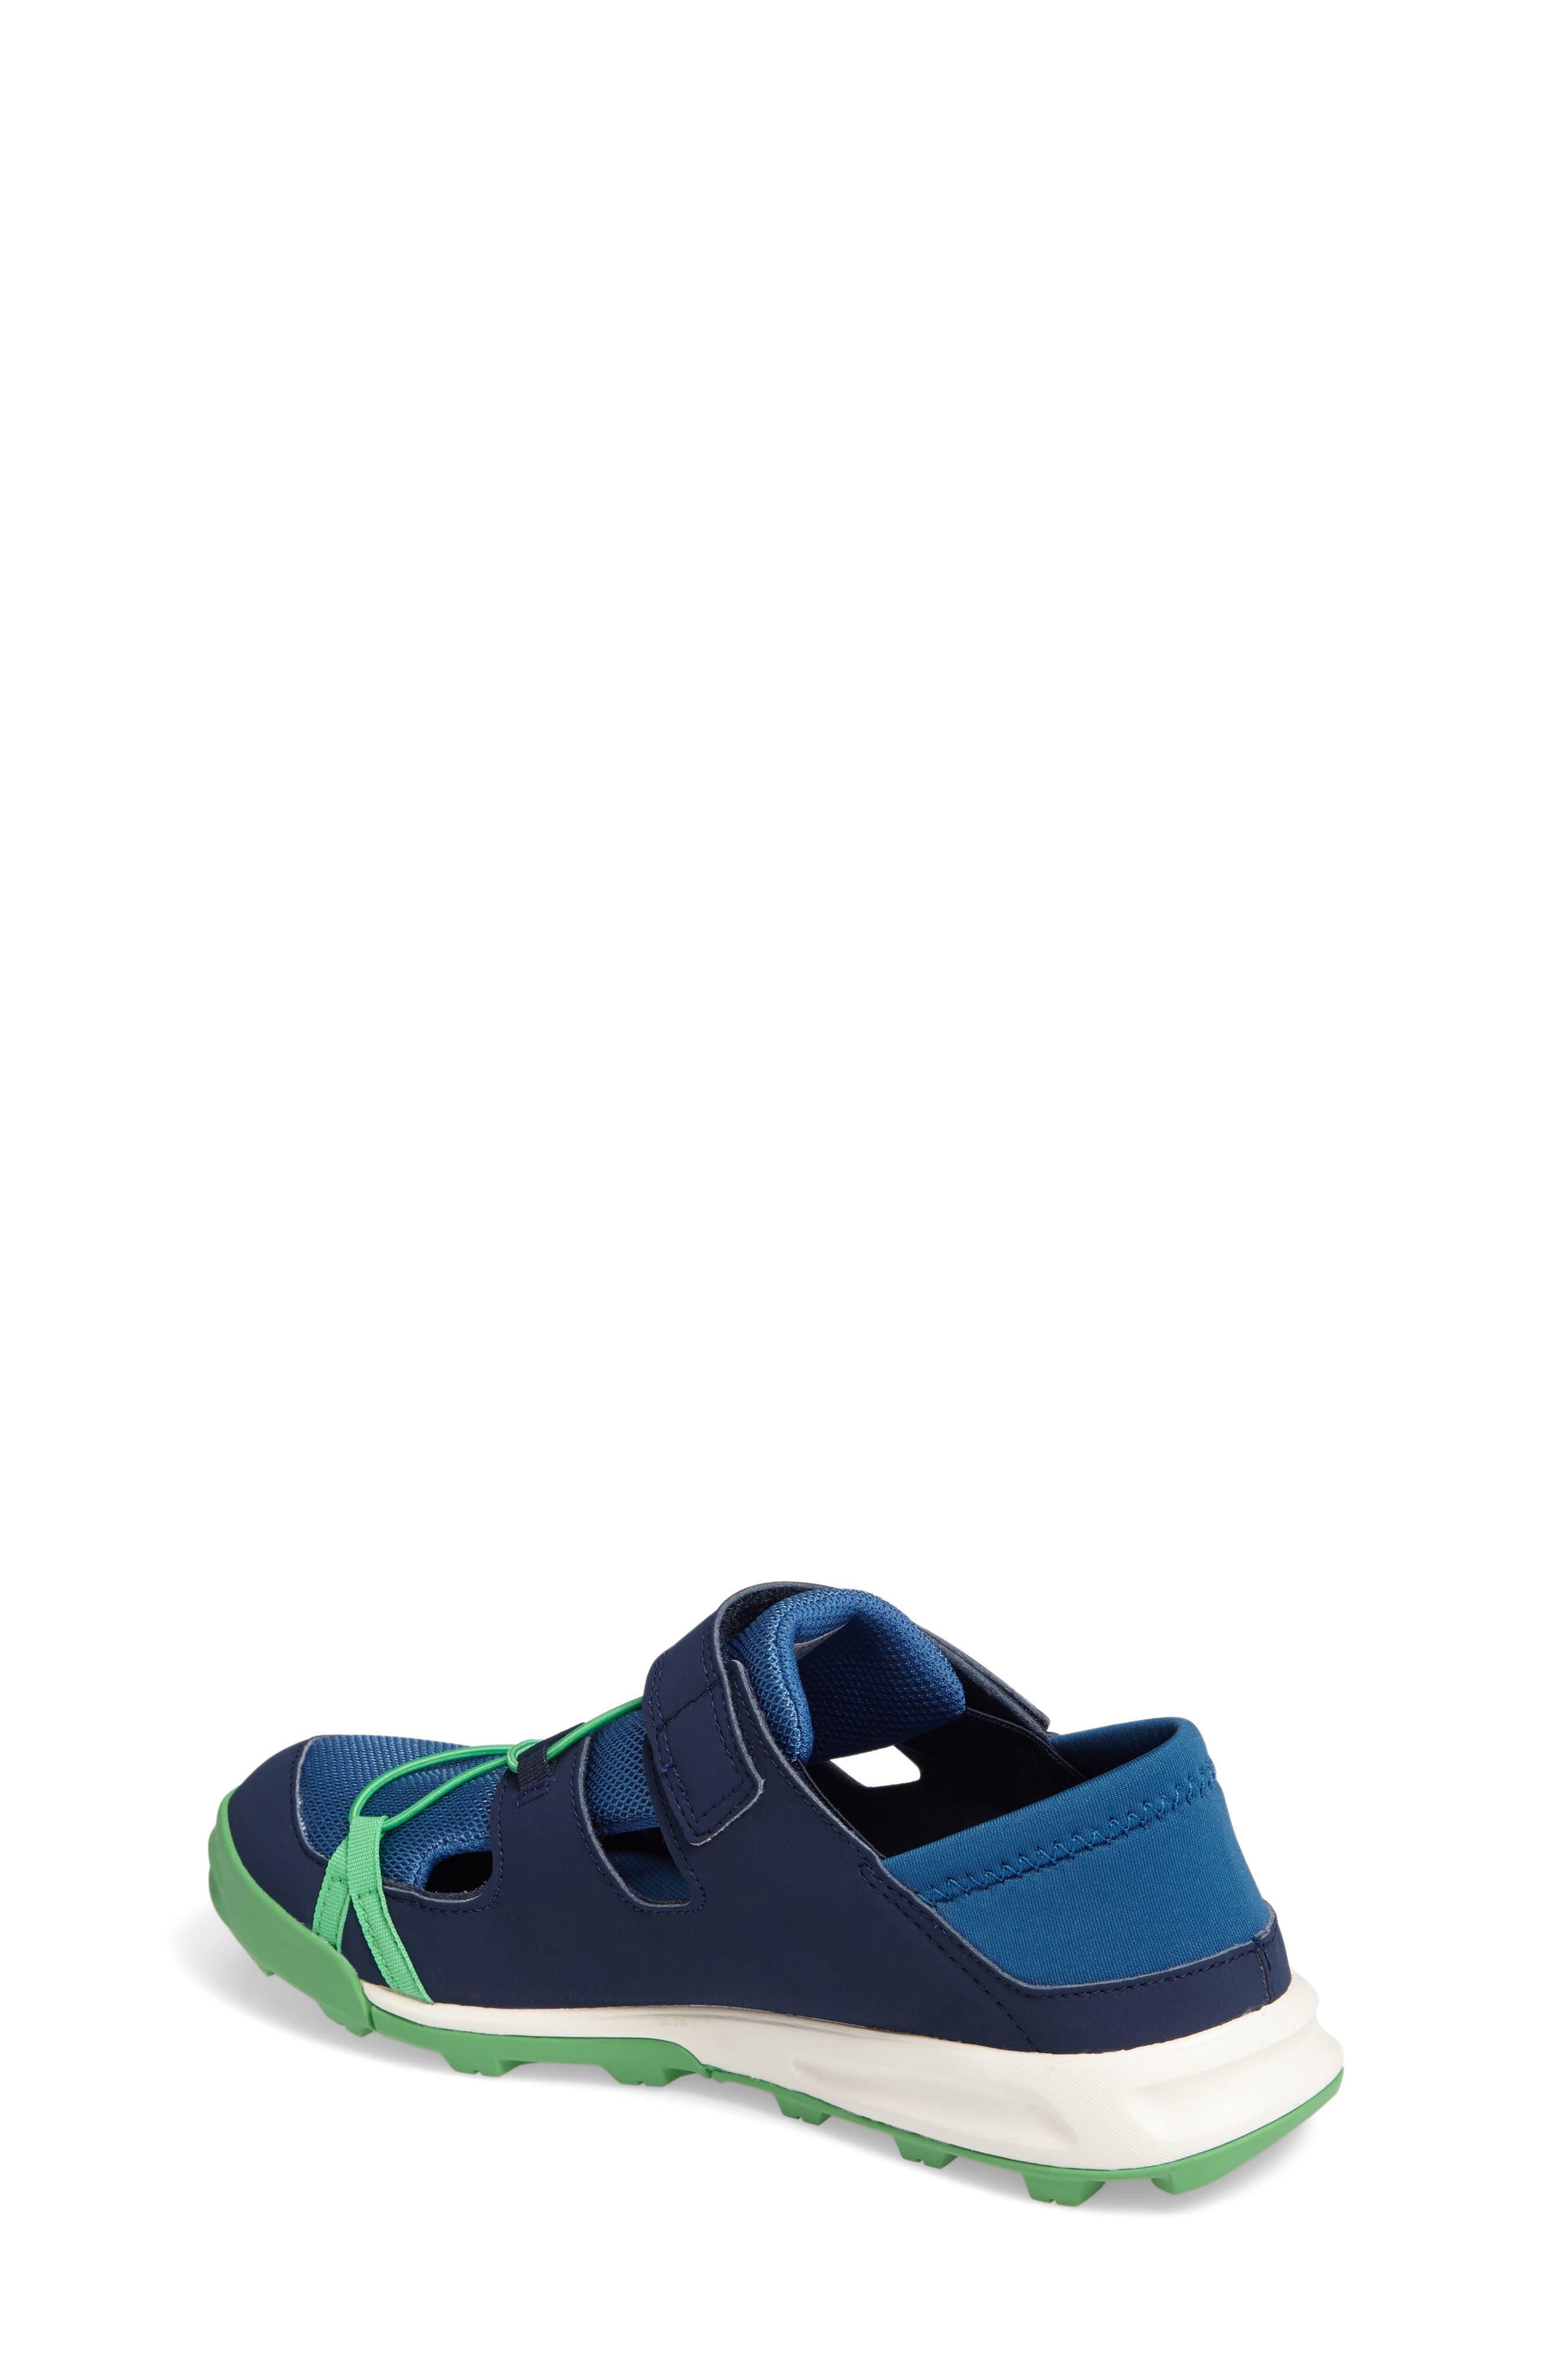 Alternate Image 2  - adidas Terrex Tivid Sneaker (Toddler, Little Kid & Big Kid)